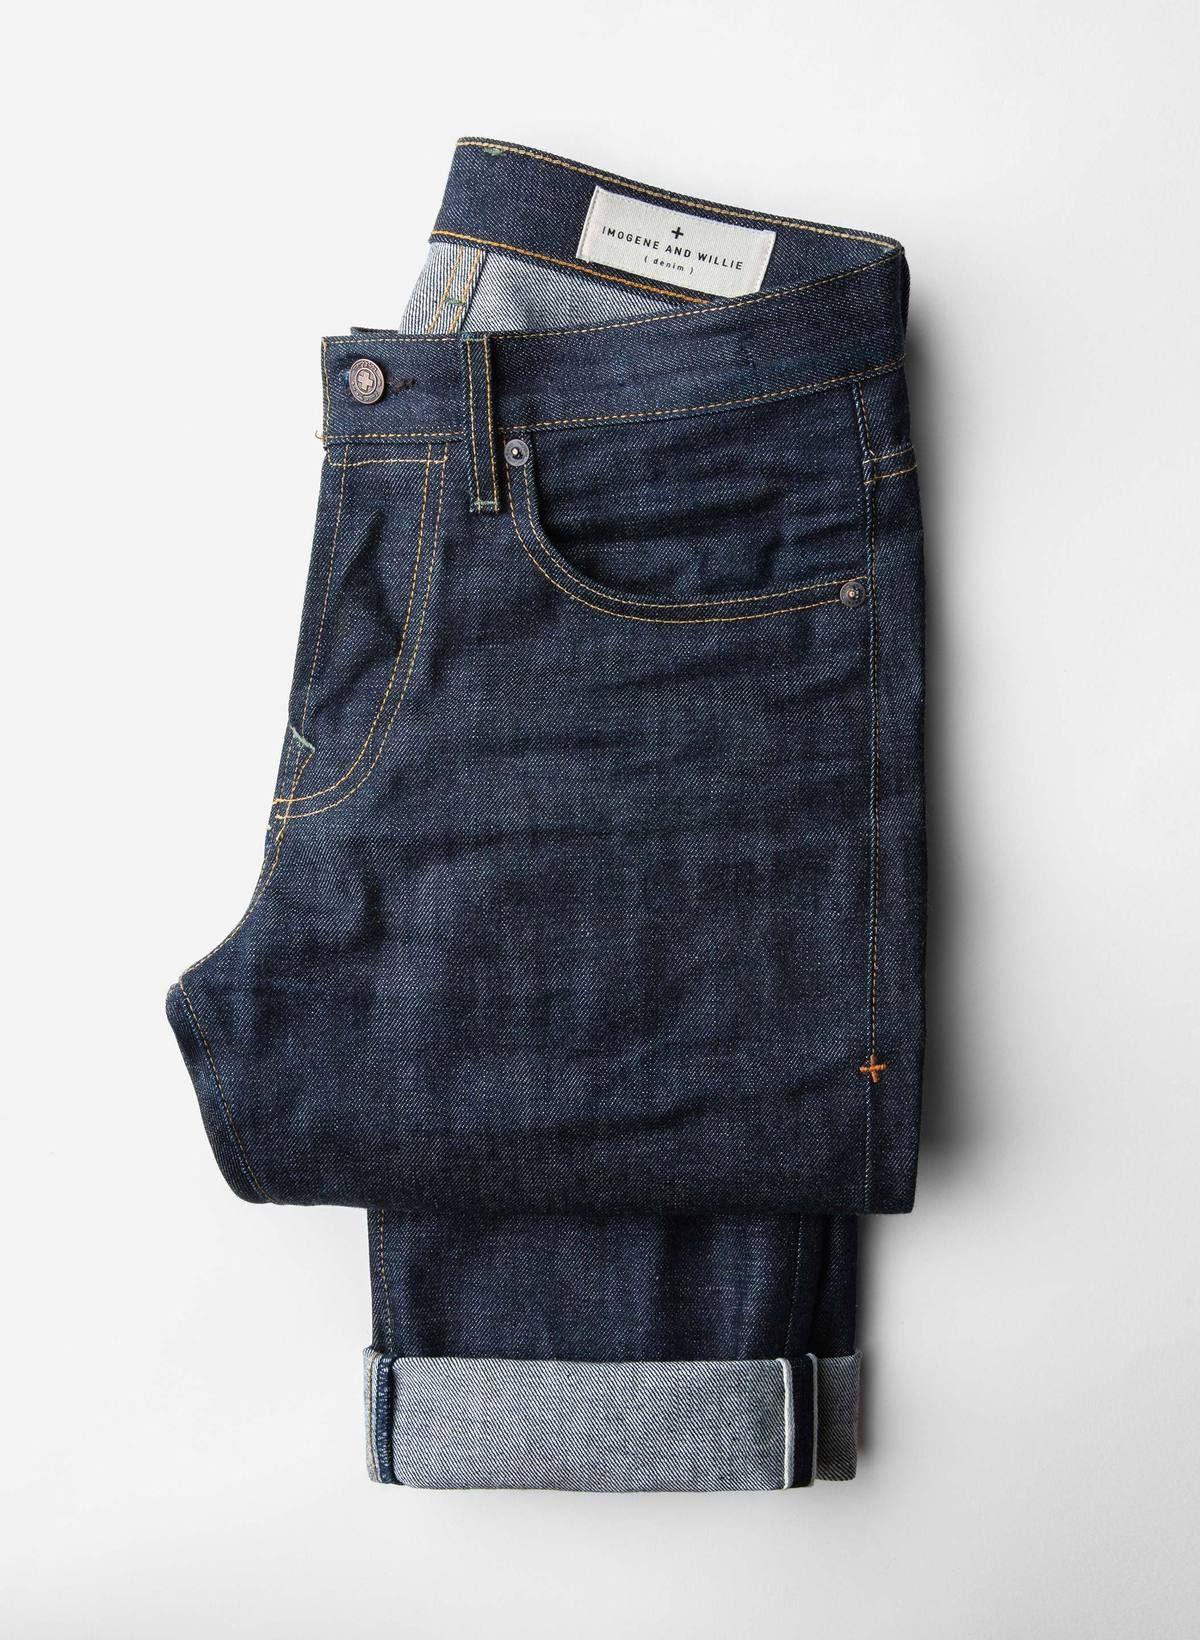 67a896758 love these jeans from imogene + willie nashville · barton slim indigo rigid  jp